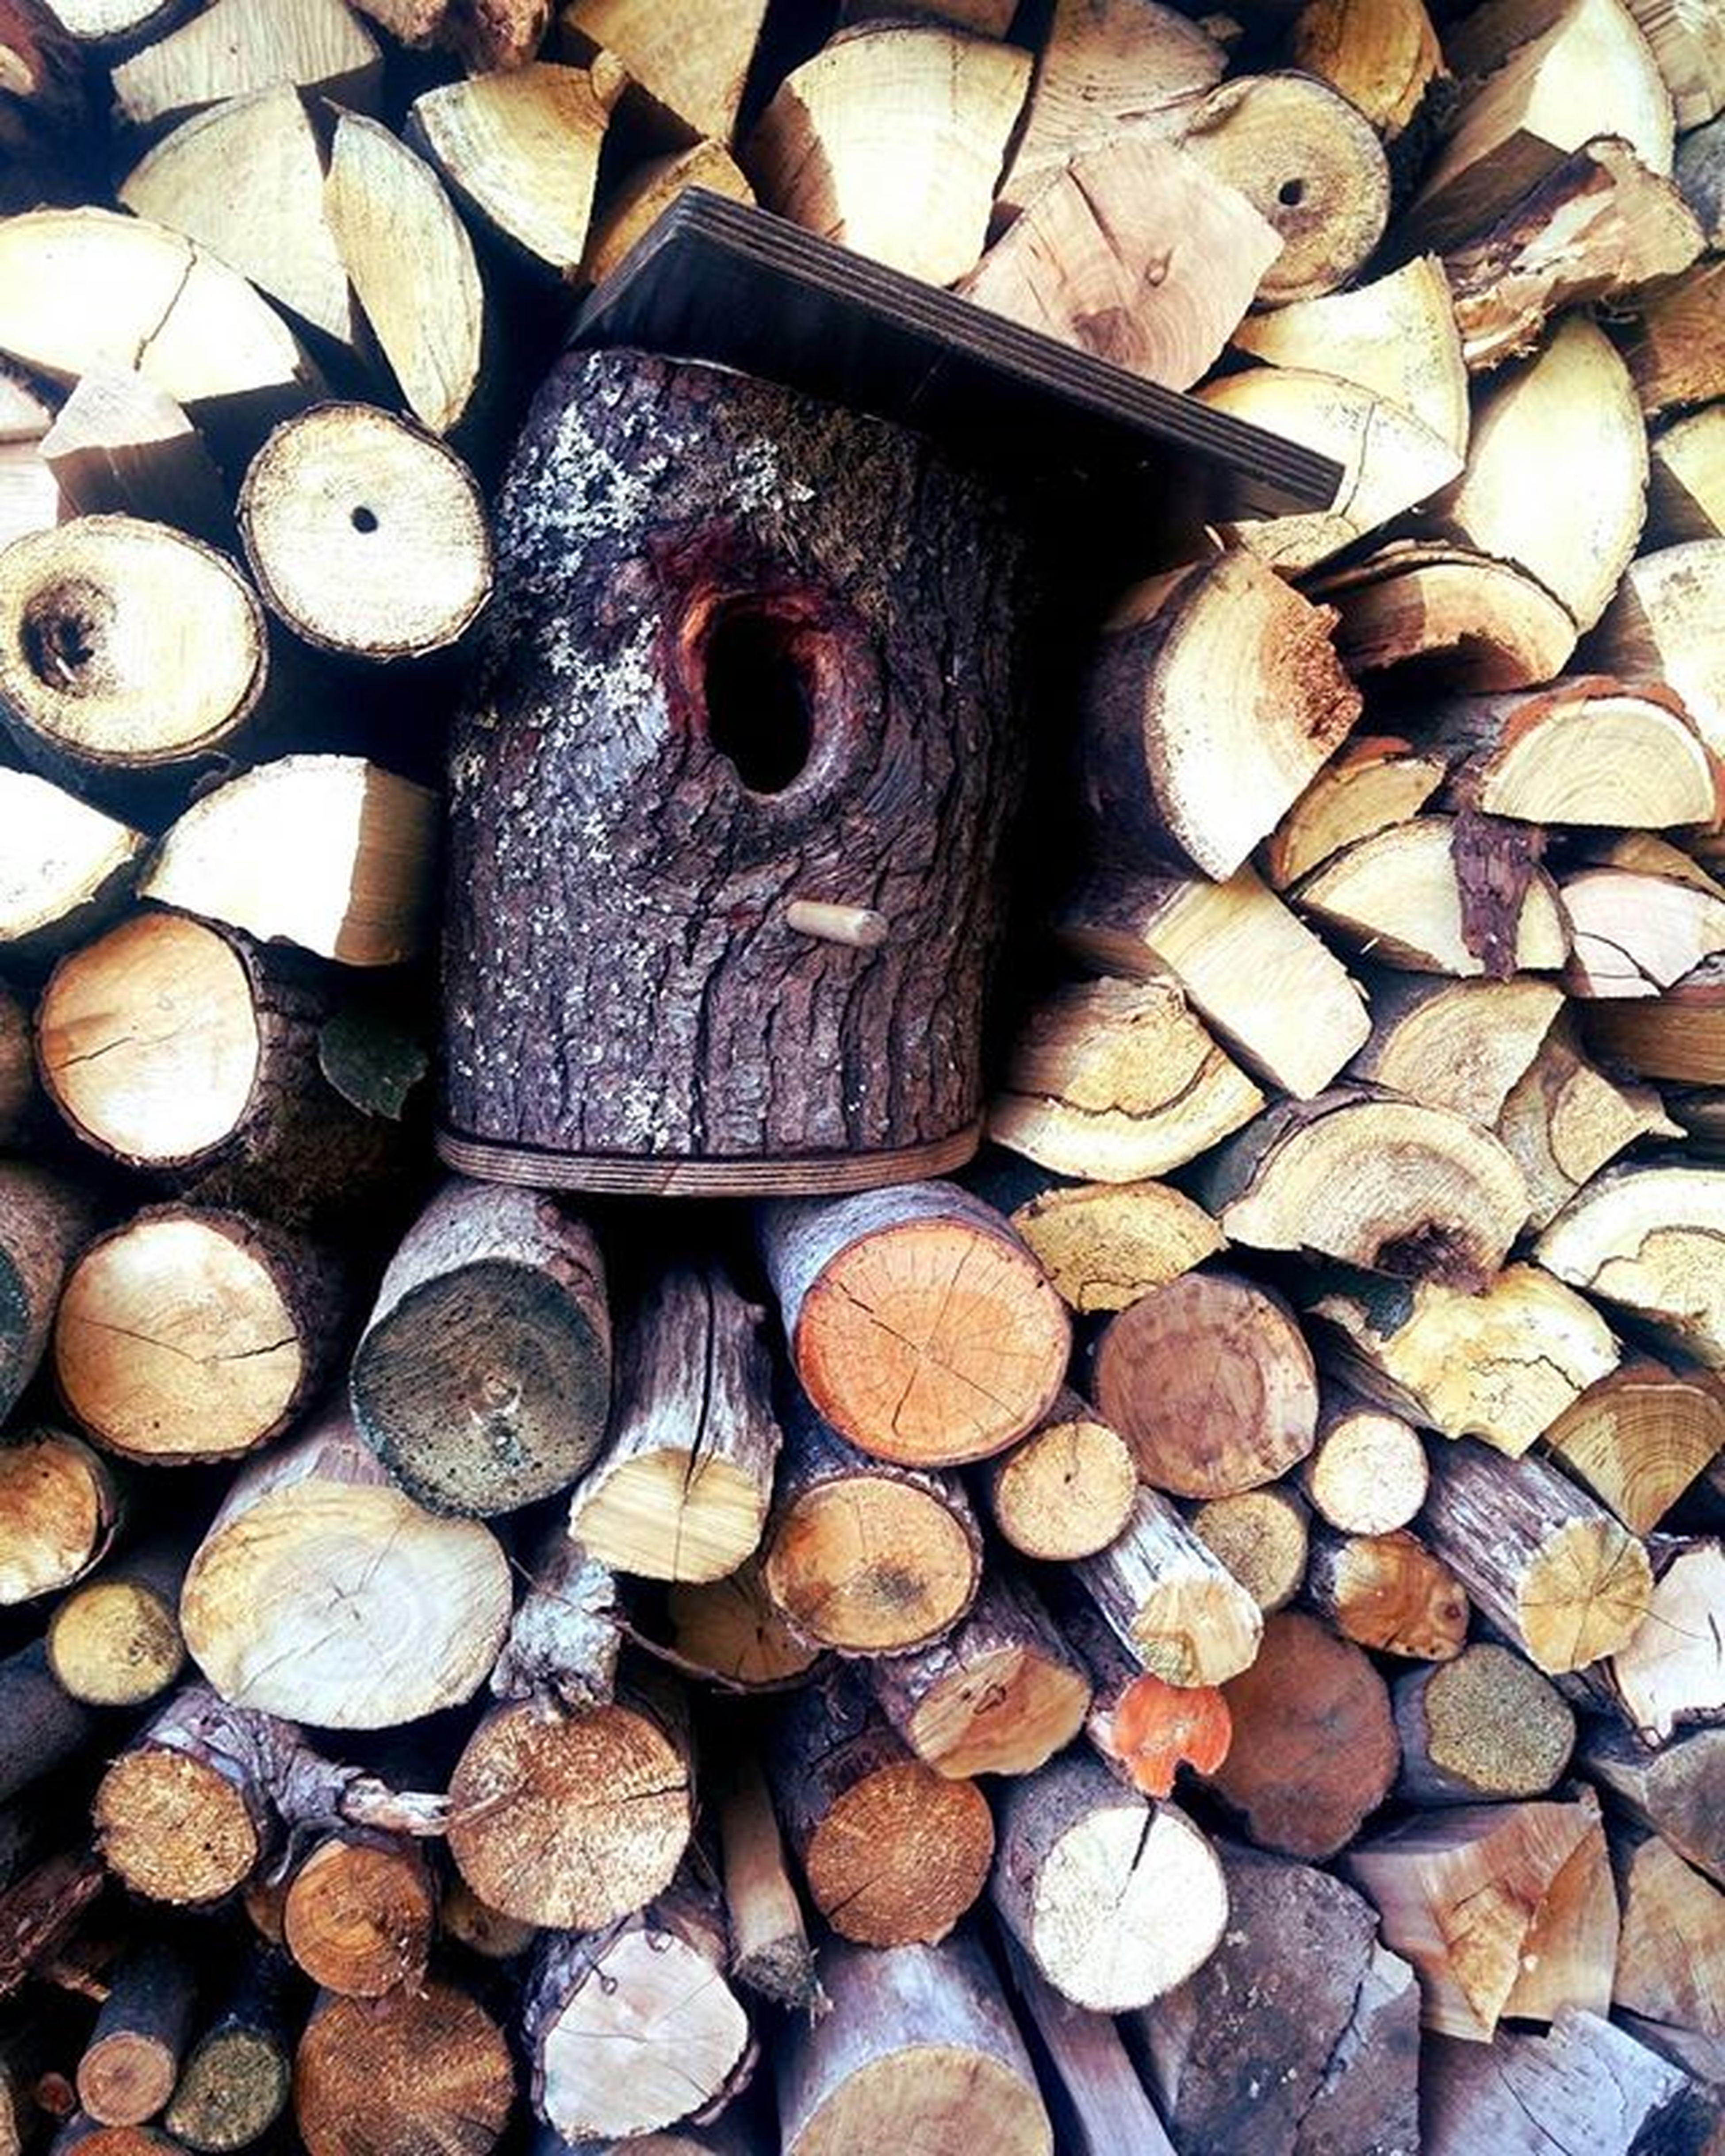 💒 Cozy Home House For Birds Wood Impressed Nature Naturelovers Enjoy Placeforlife Tiny Cute Domcek